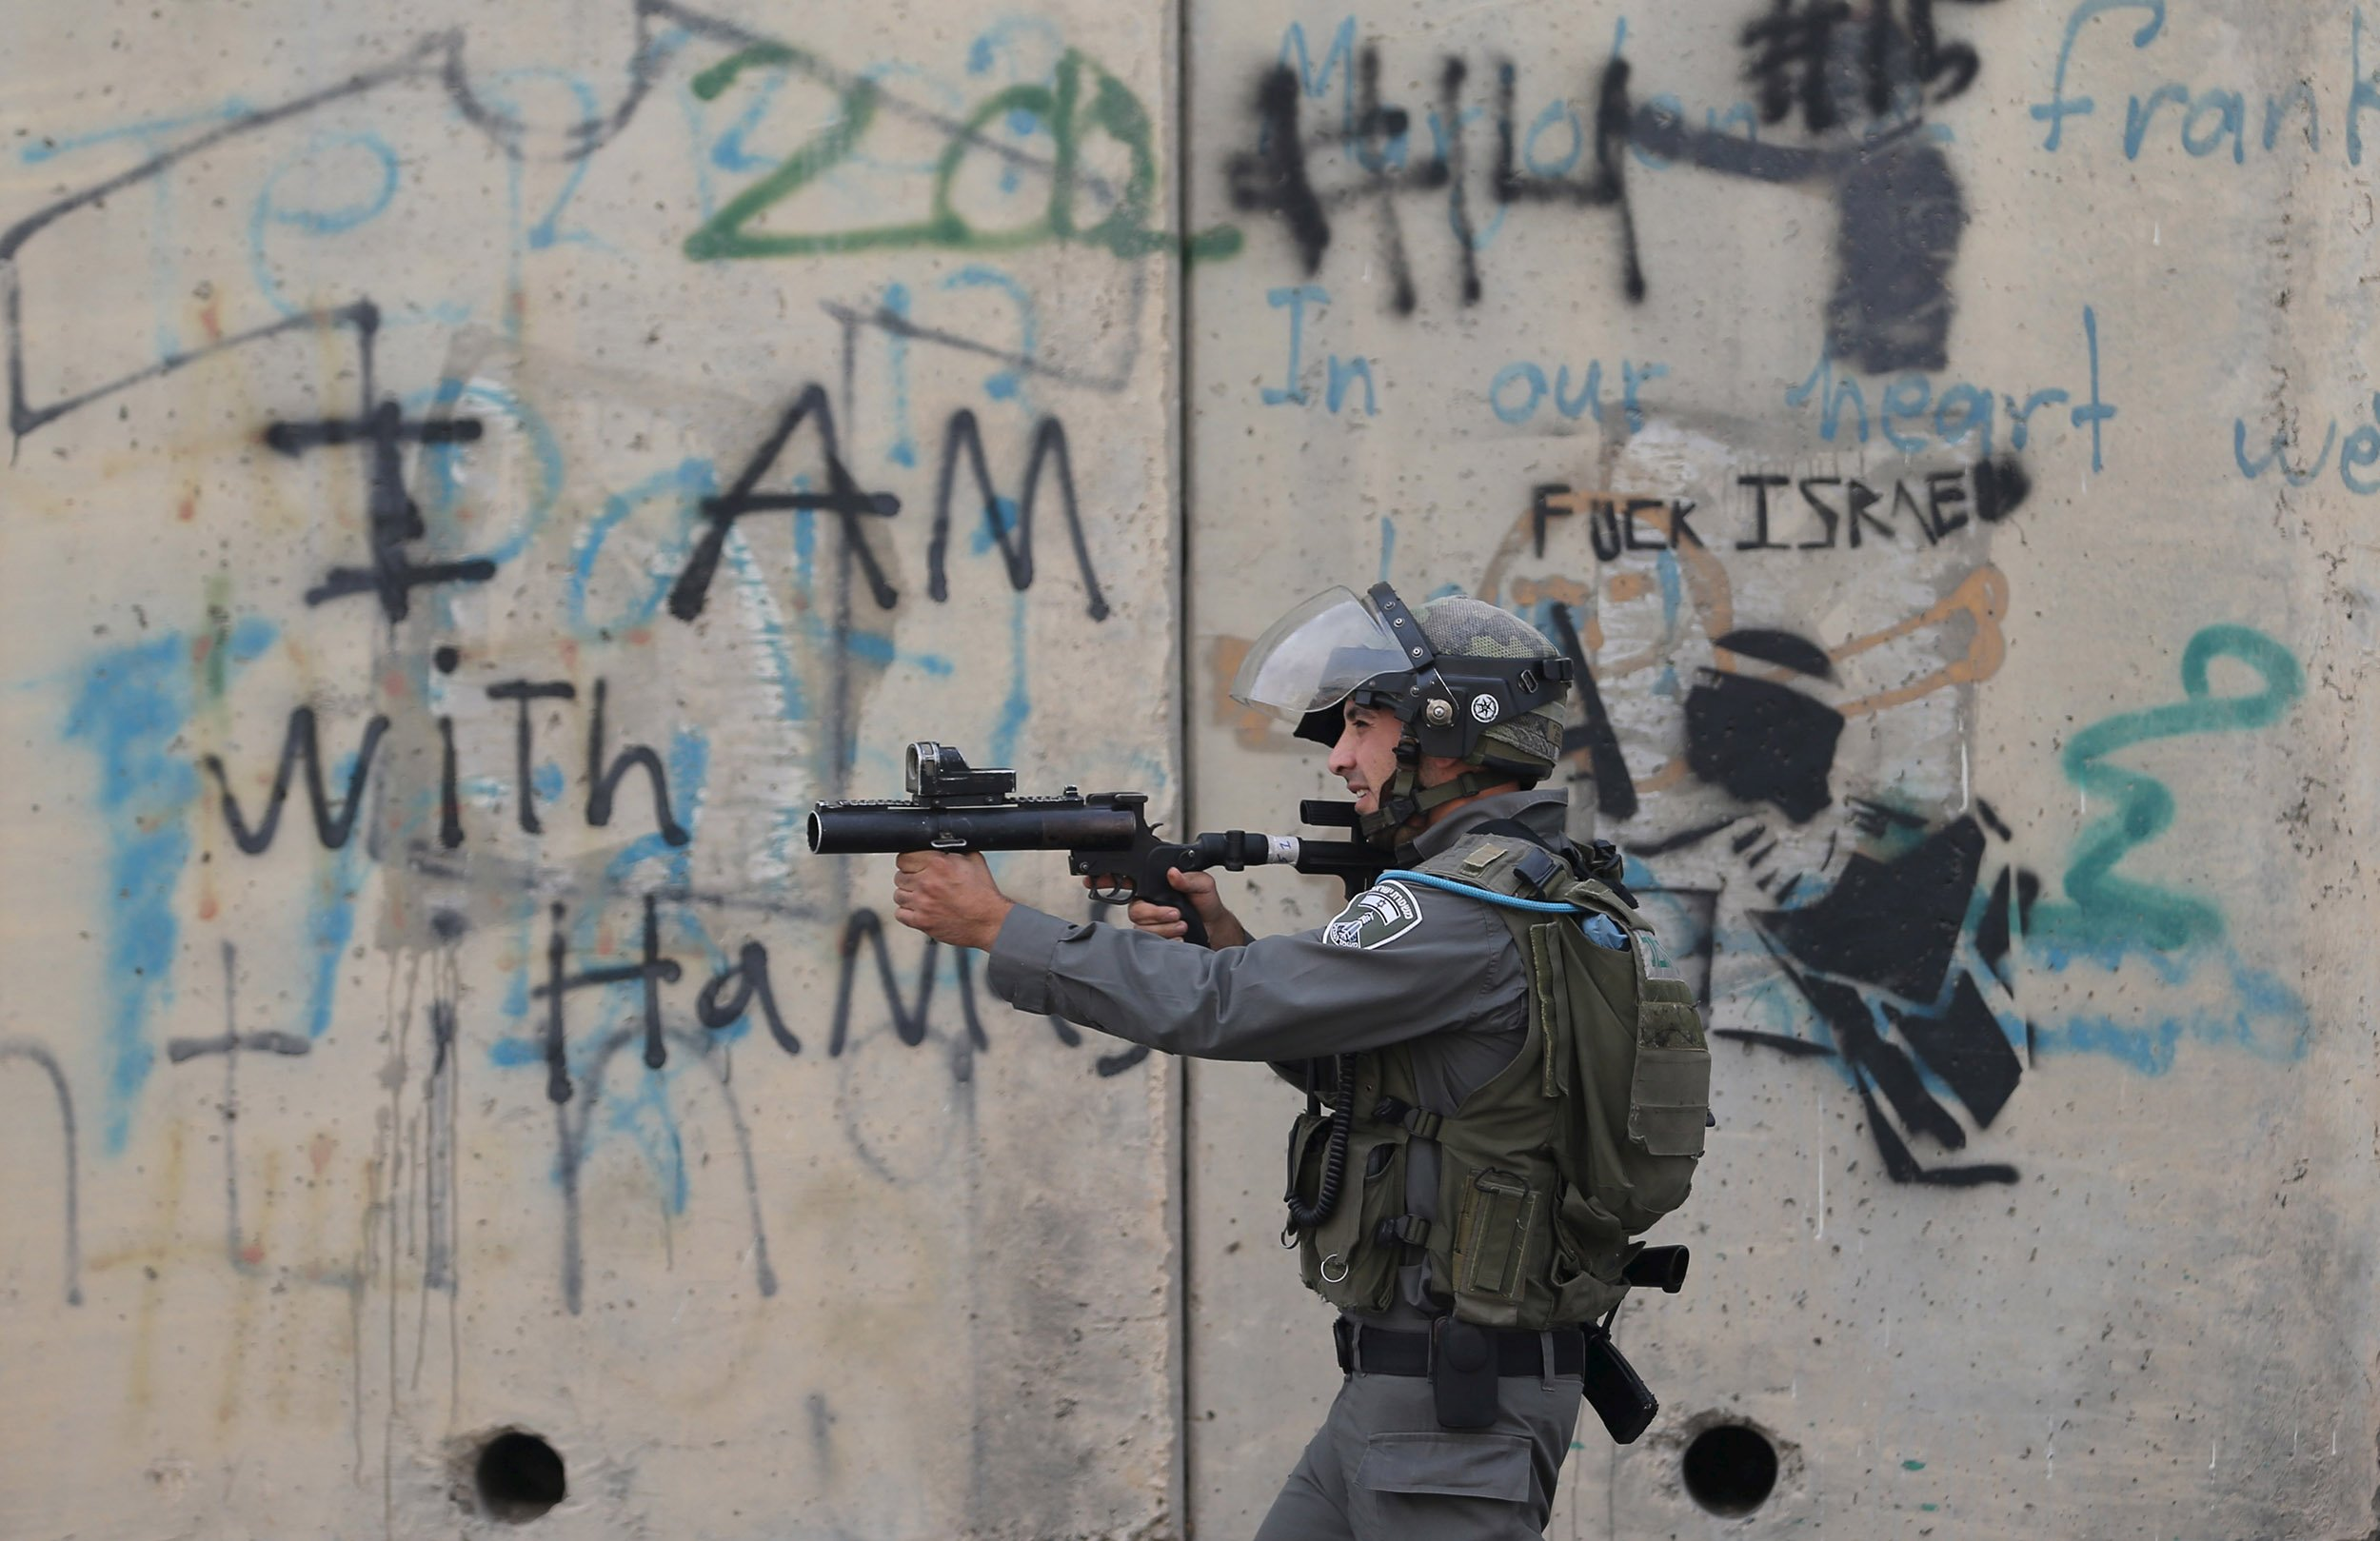 11_13_IsraelPalestine_01